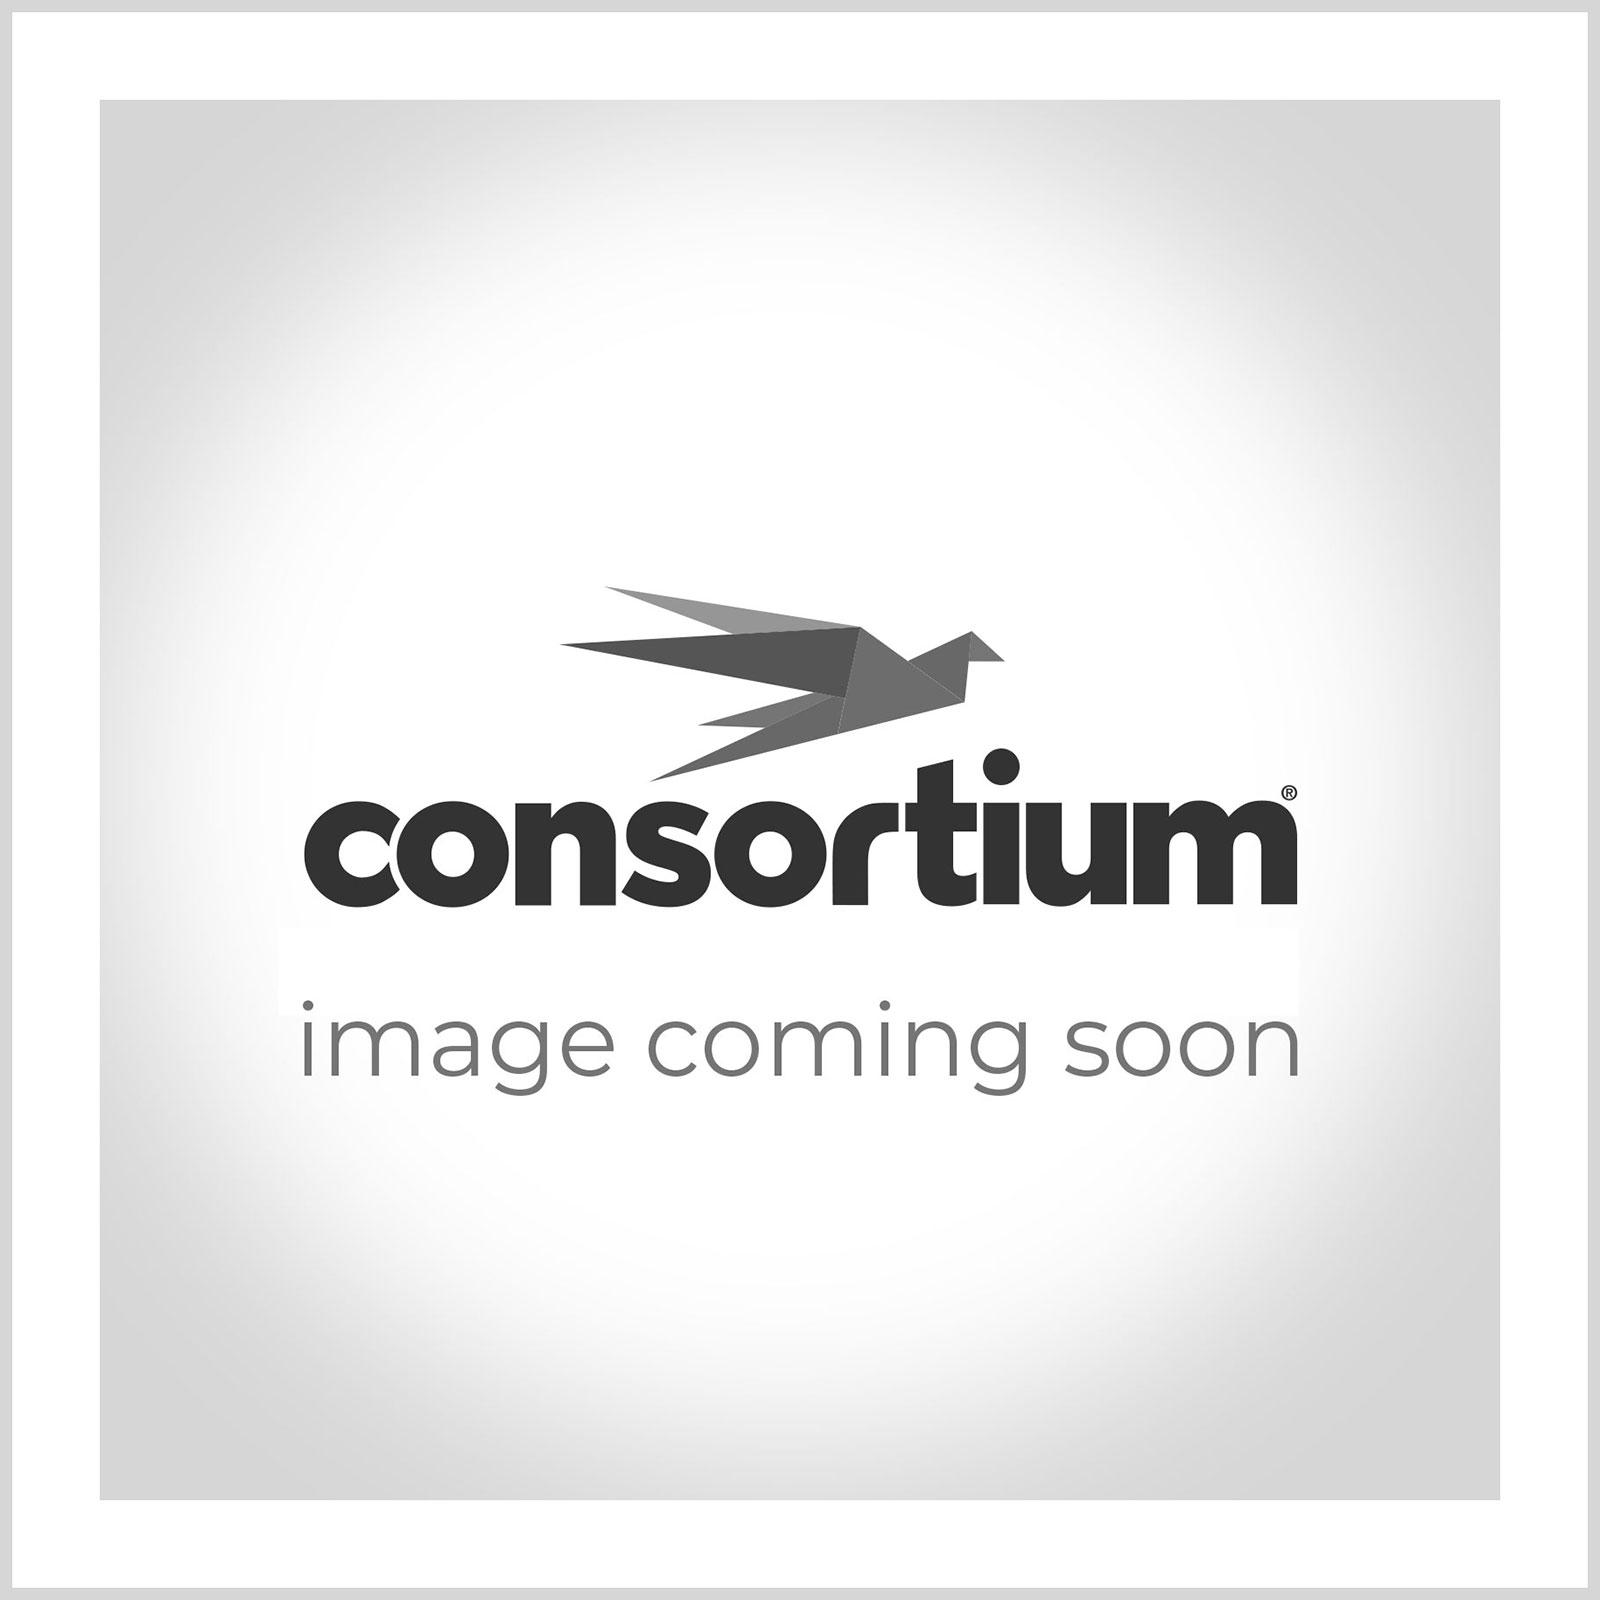 Beko 20L Compact Microwave